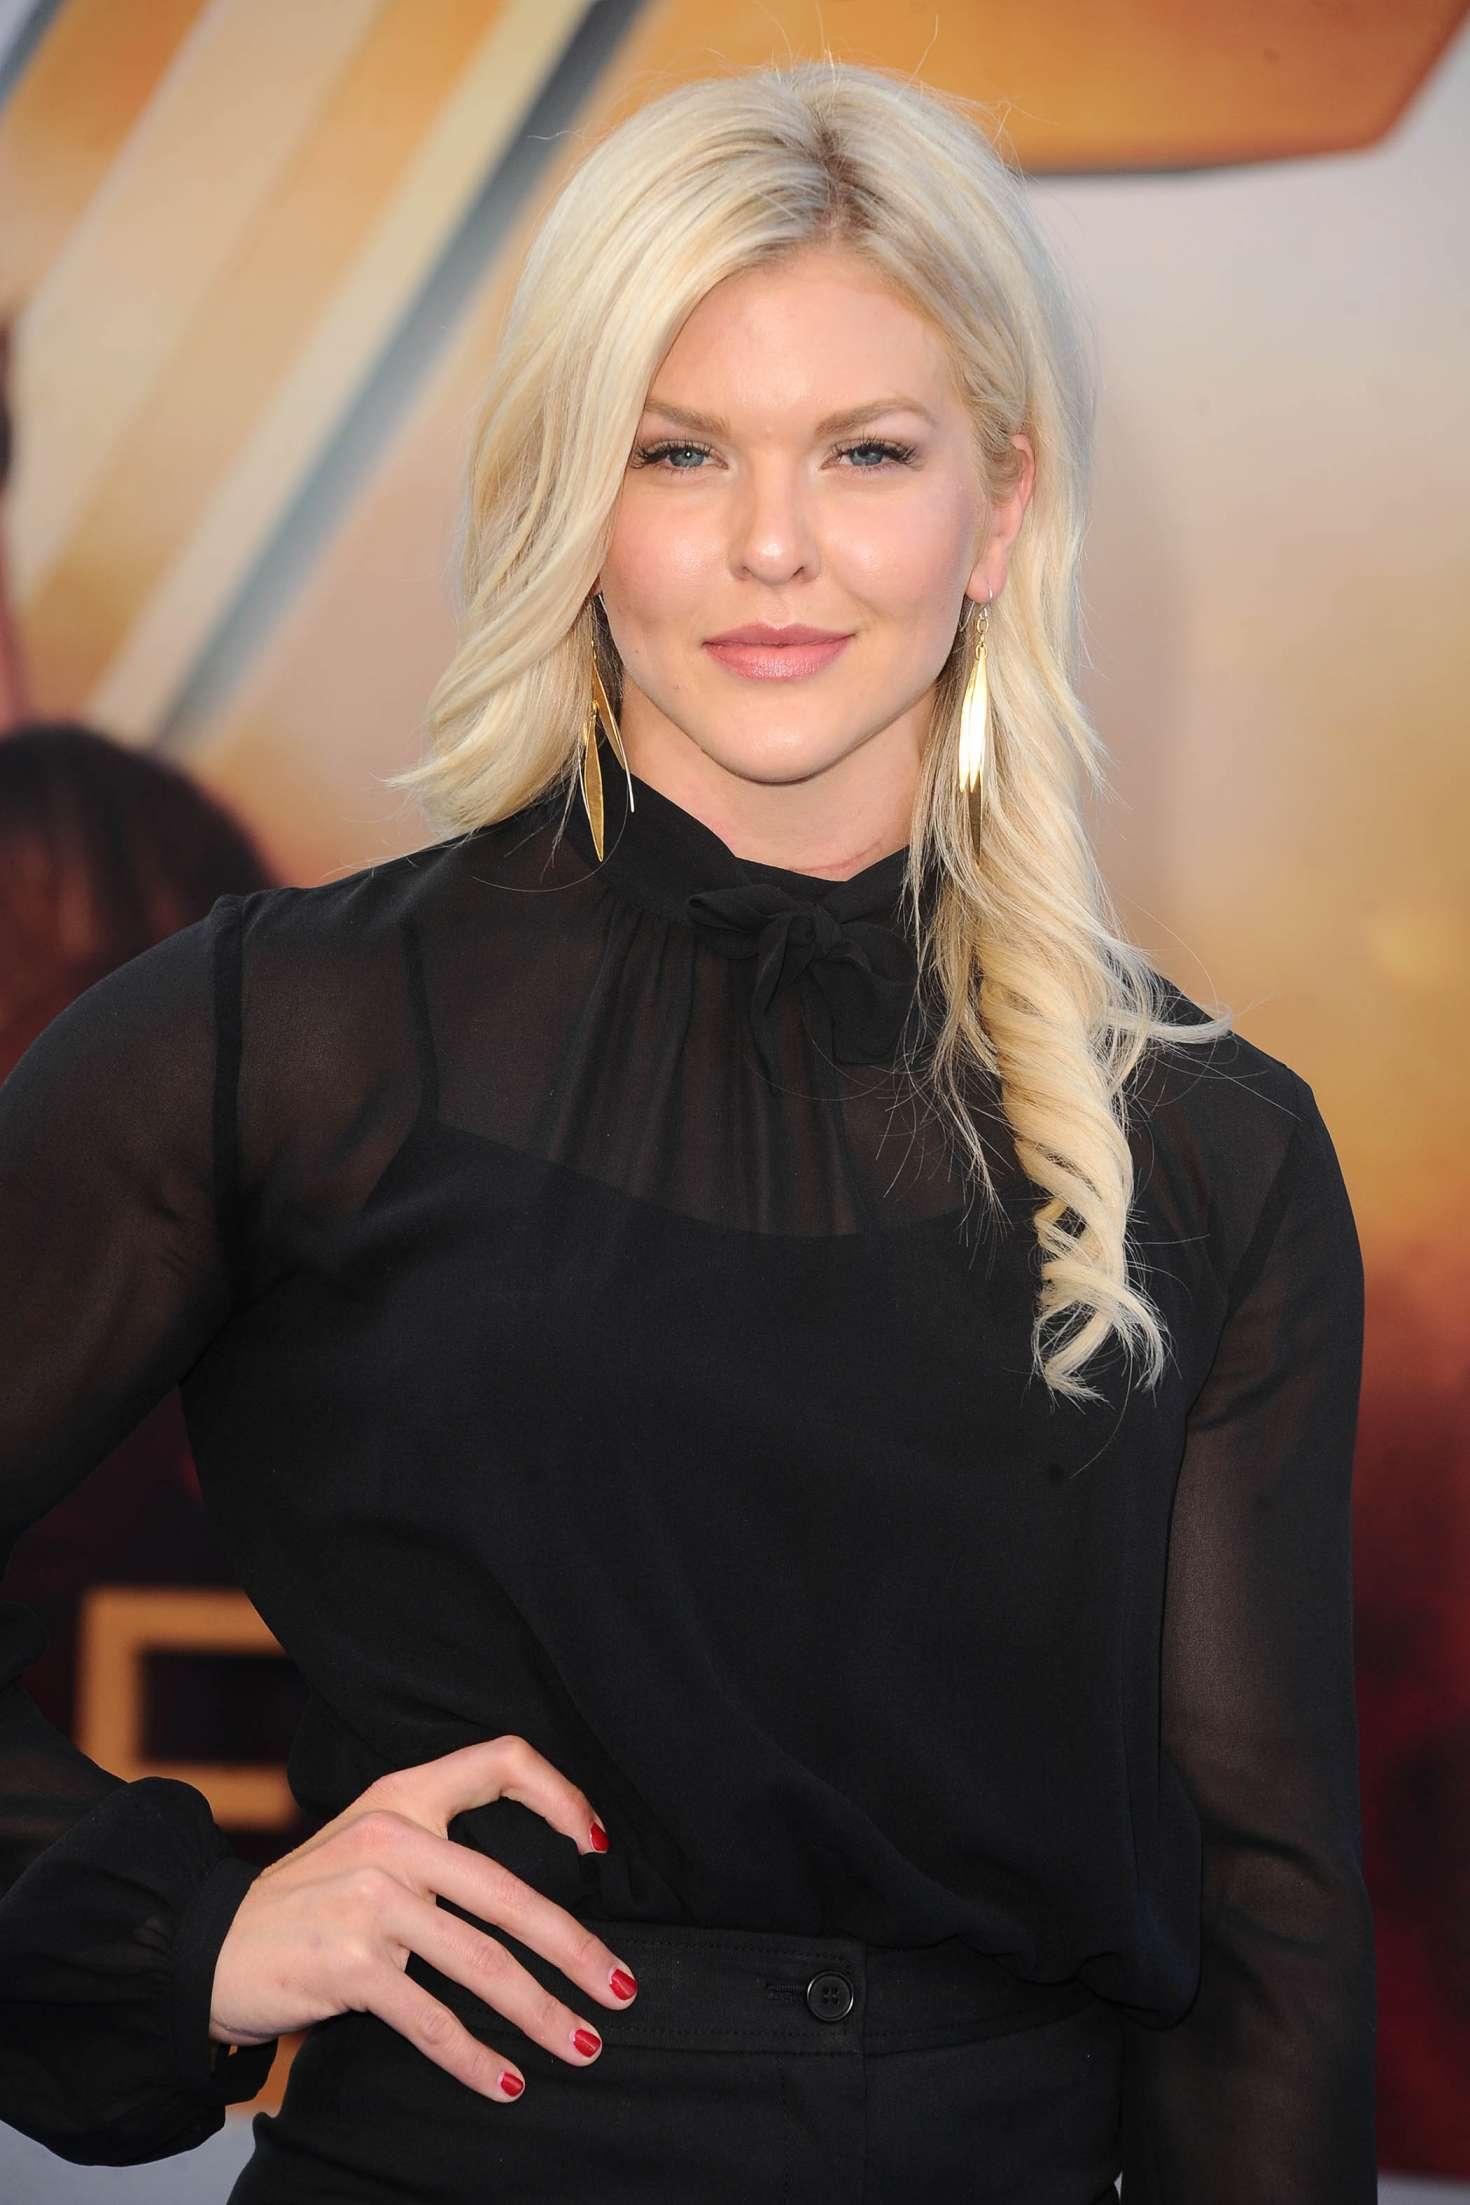 Brooke Ence: Wonder Woman Premiere in Los Angeles -34